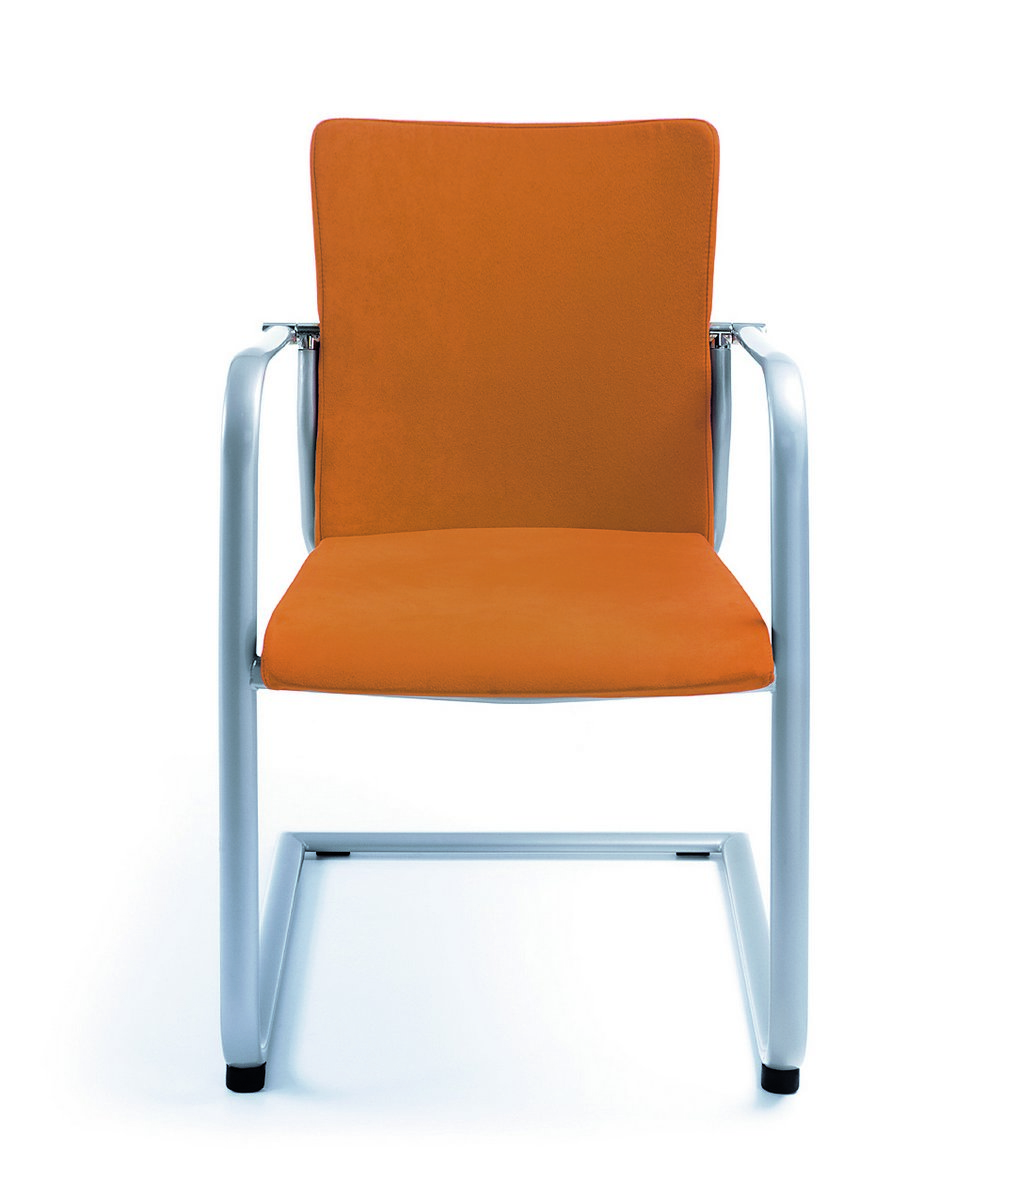 Żółte krzesła konferencyjne KALA, żółte fotele konferencyjne KALA